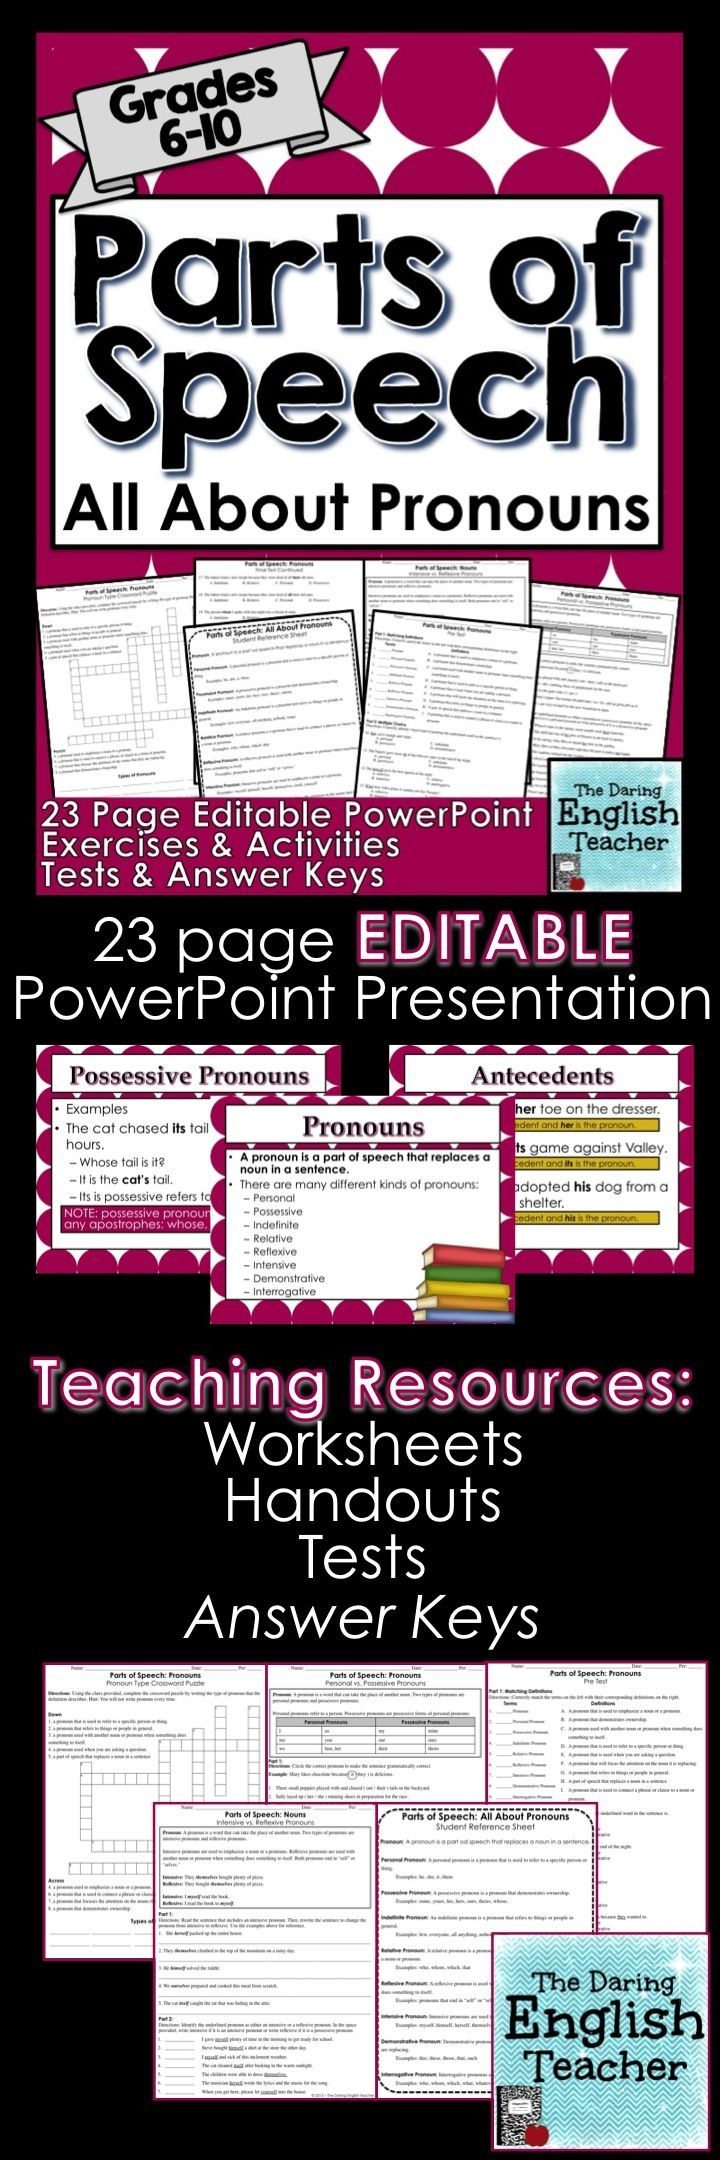 Workbooks high school language arts worksheets : Best 25+ Middle school grammar ideas on Pinterest | Middle school ...